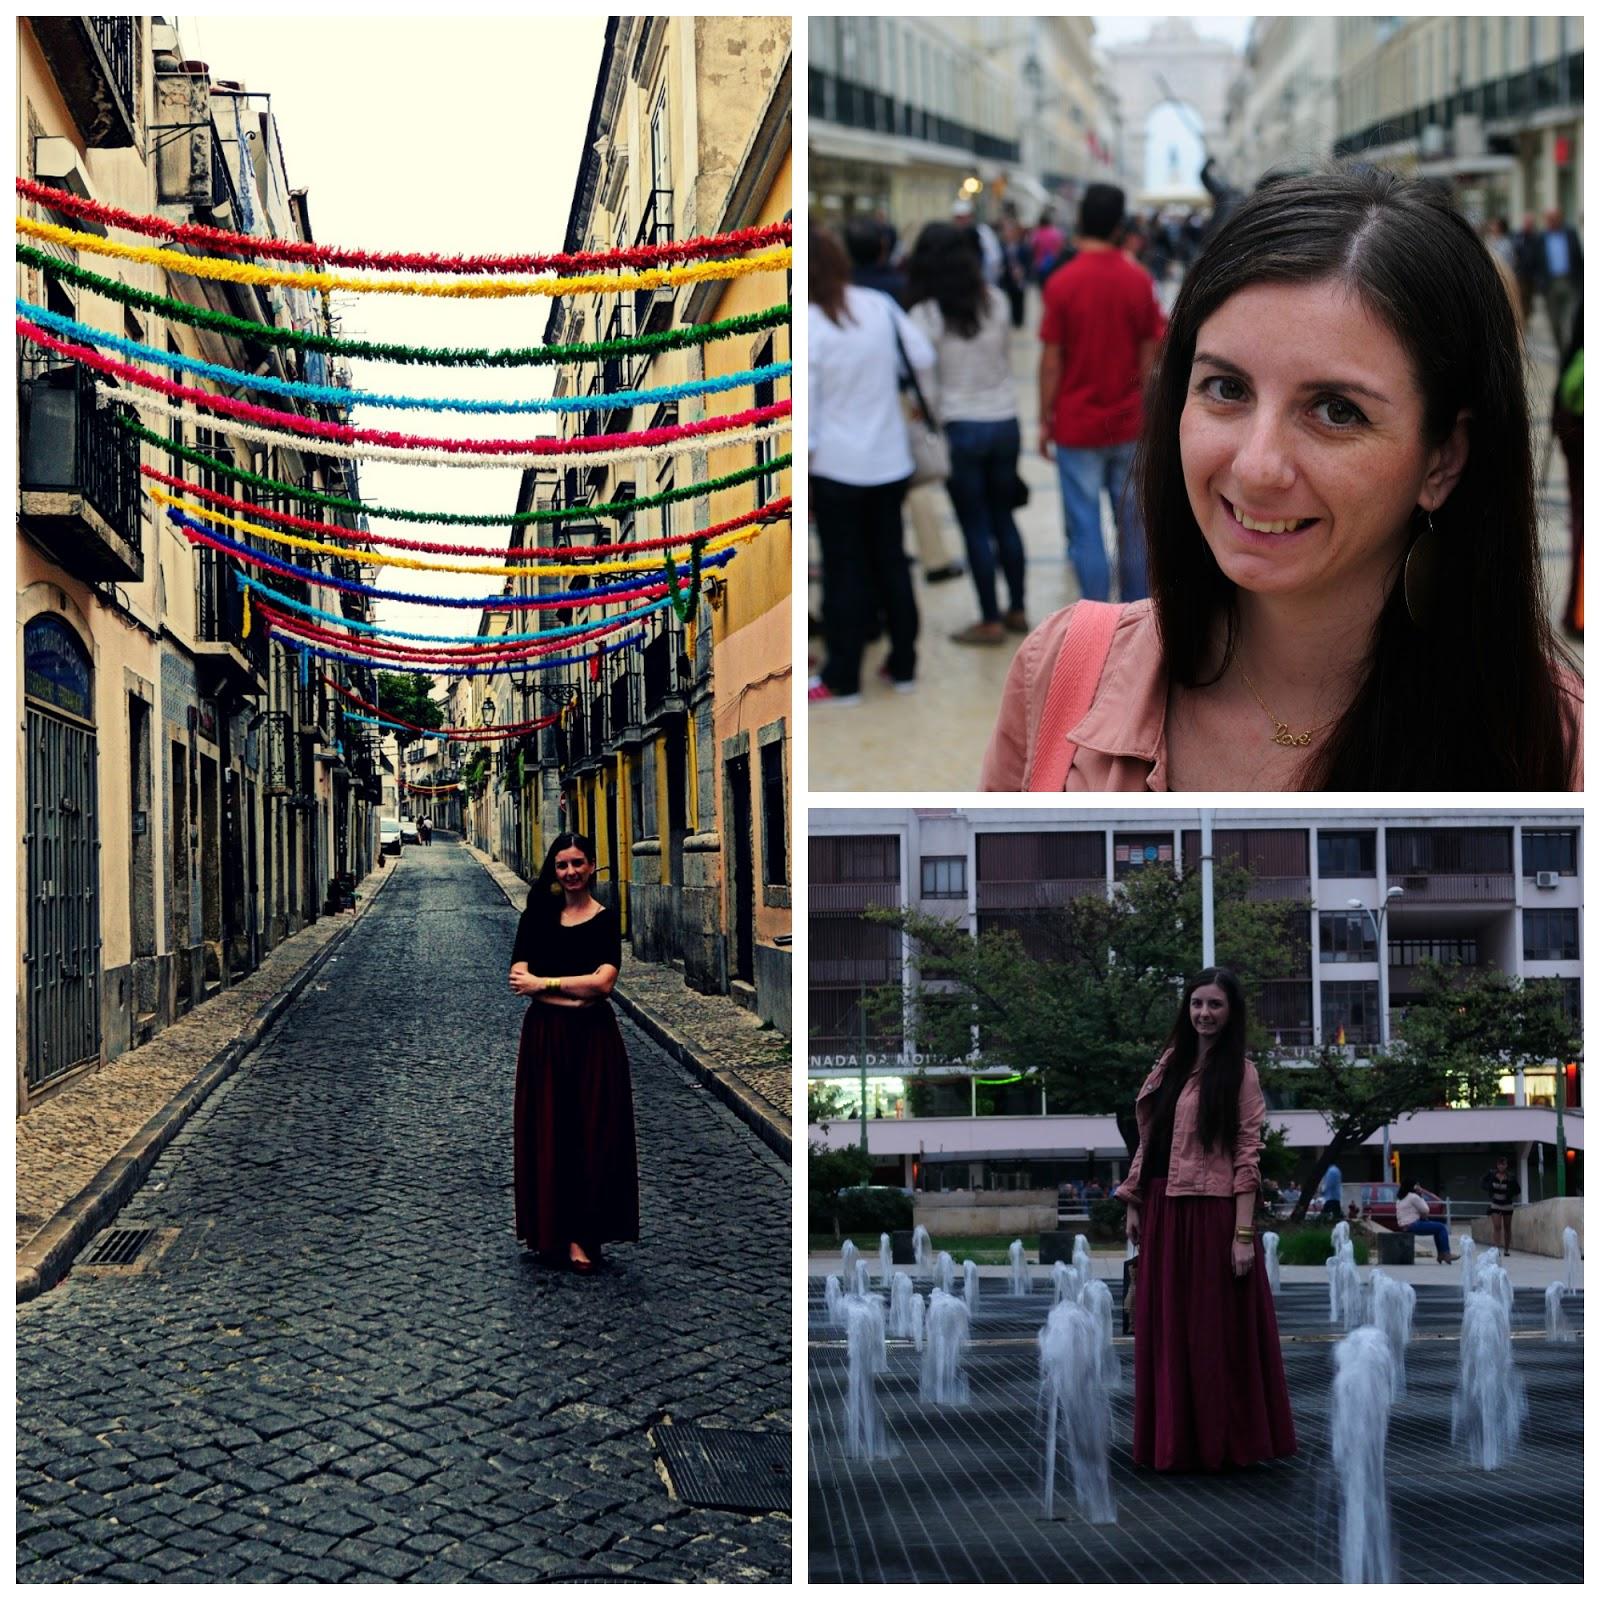 http://sanjaburgundy.blogspot.com/2014/01/portugal-day-2-lisbon.html